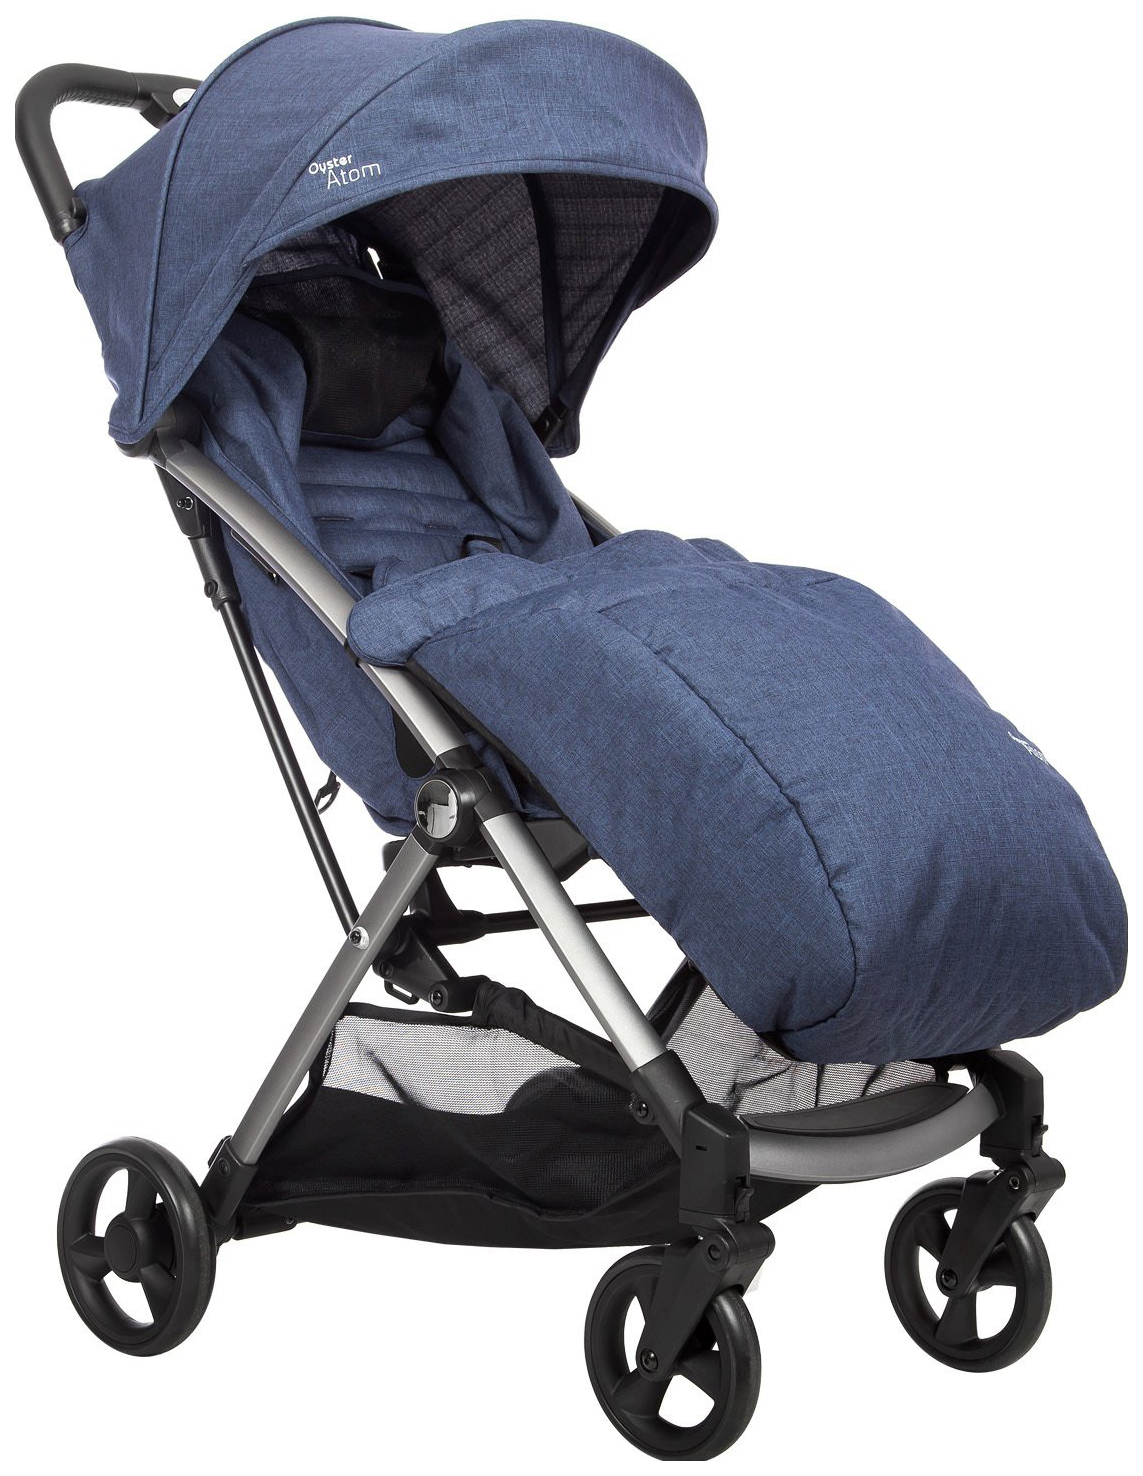 Купить Прогулочная коляска Oyster Atom - Oxford Blue, Коляски книжки